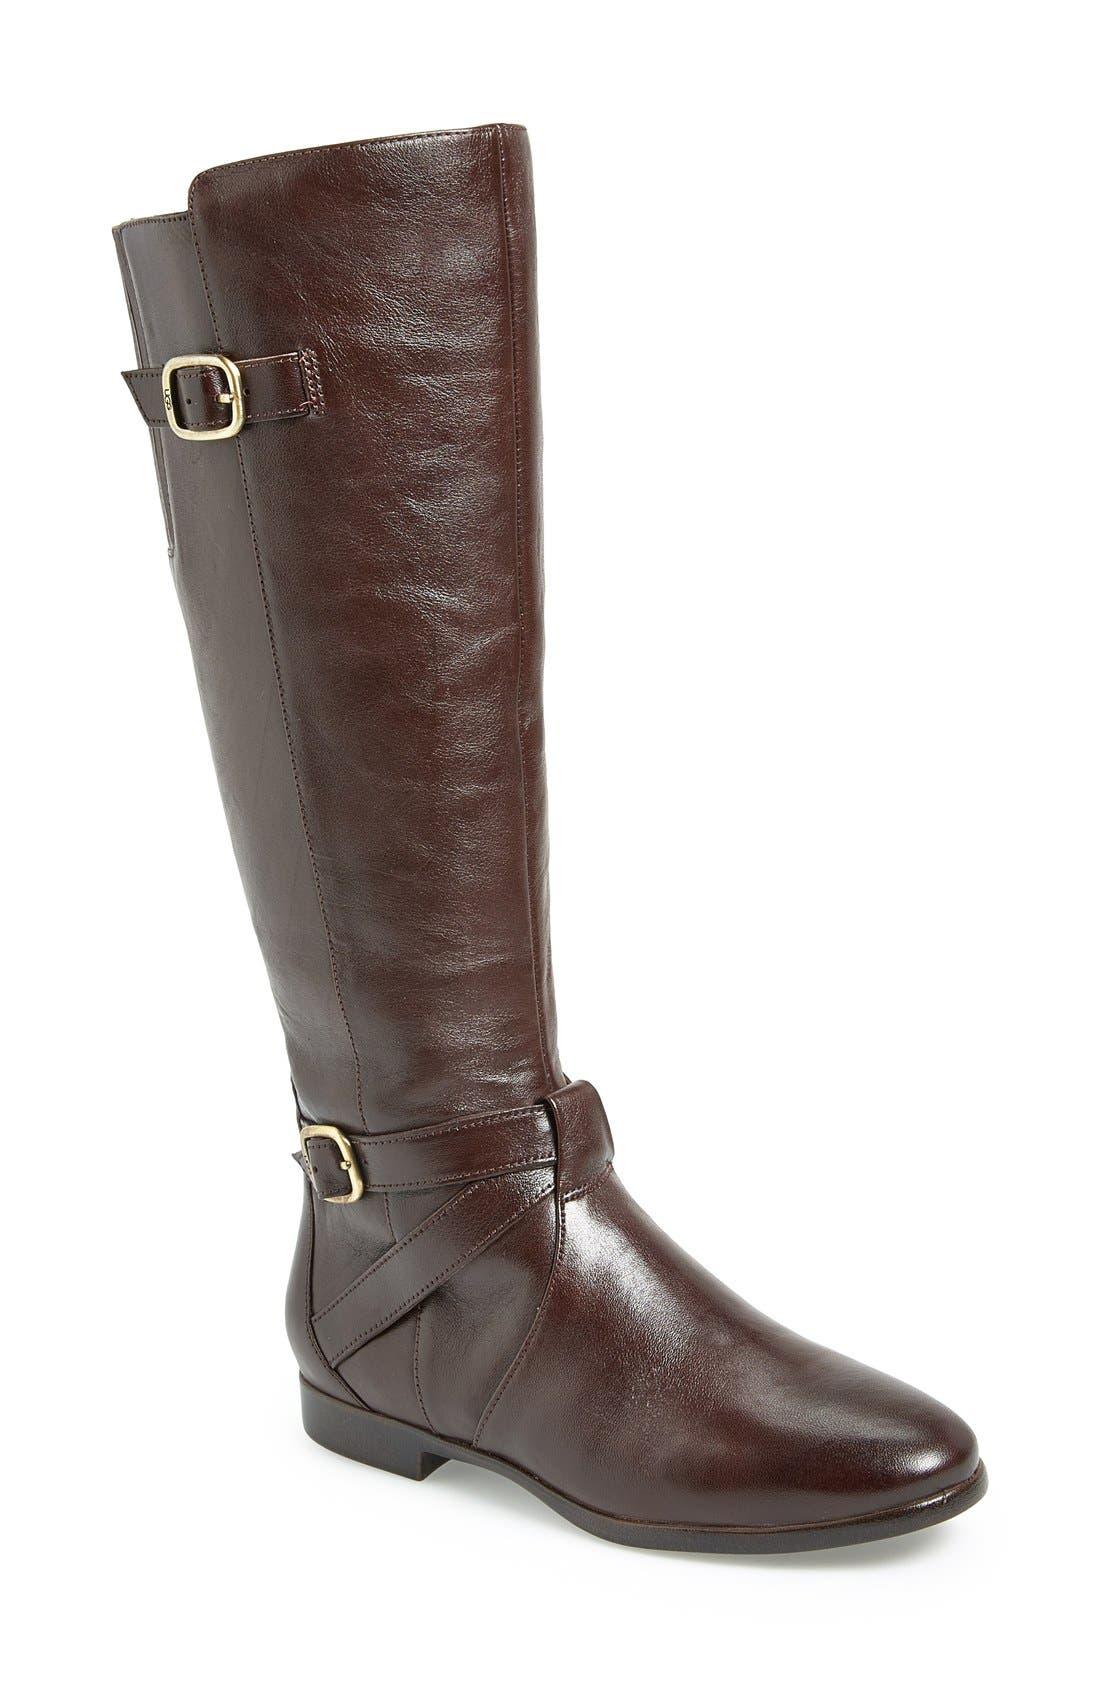 Alternate Image 1 Selected - UGG® Australia 'Beryl' Riding Boot (Wide Calf) (Women)